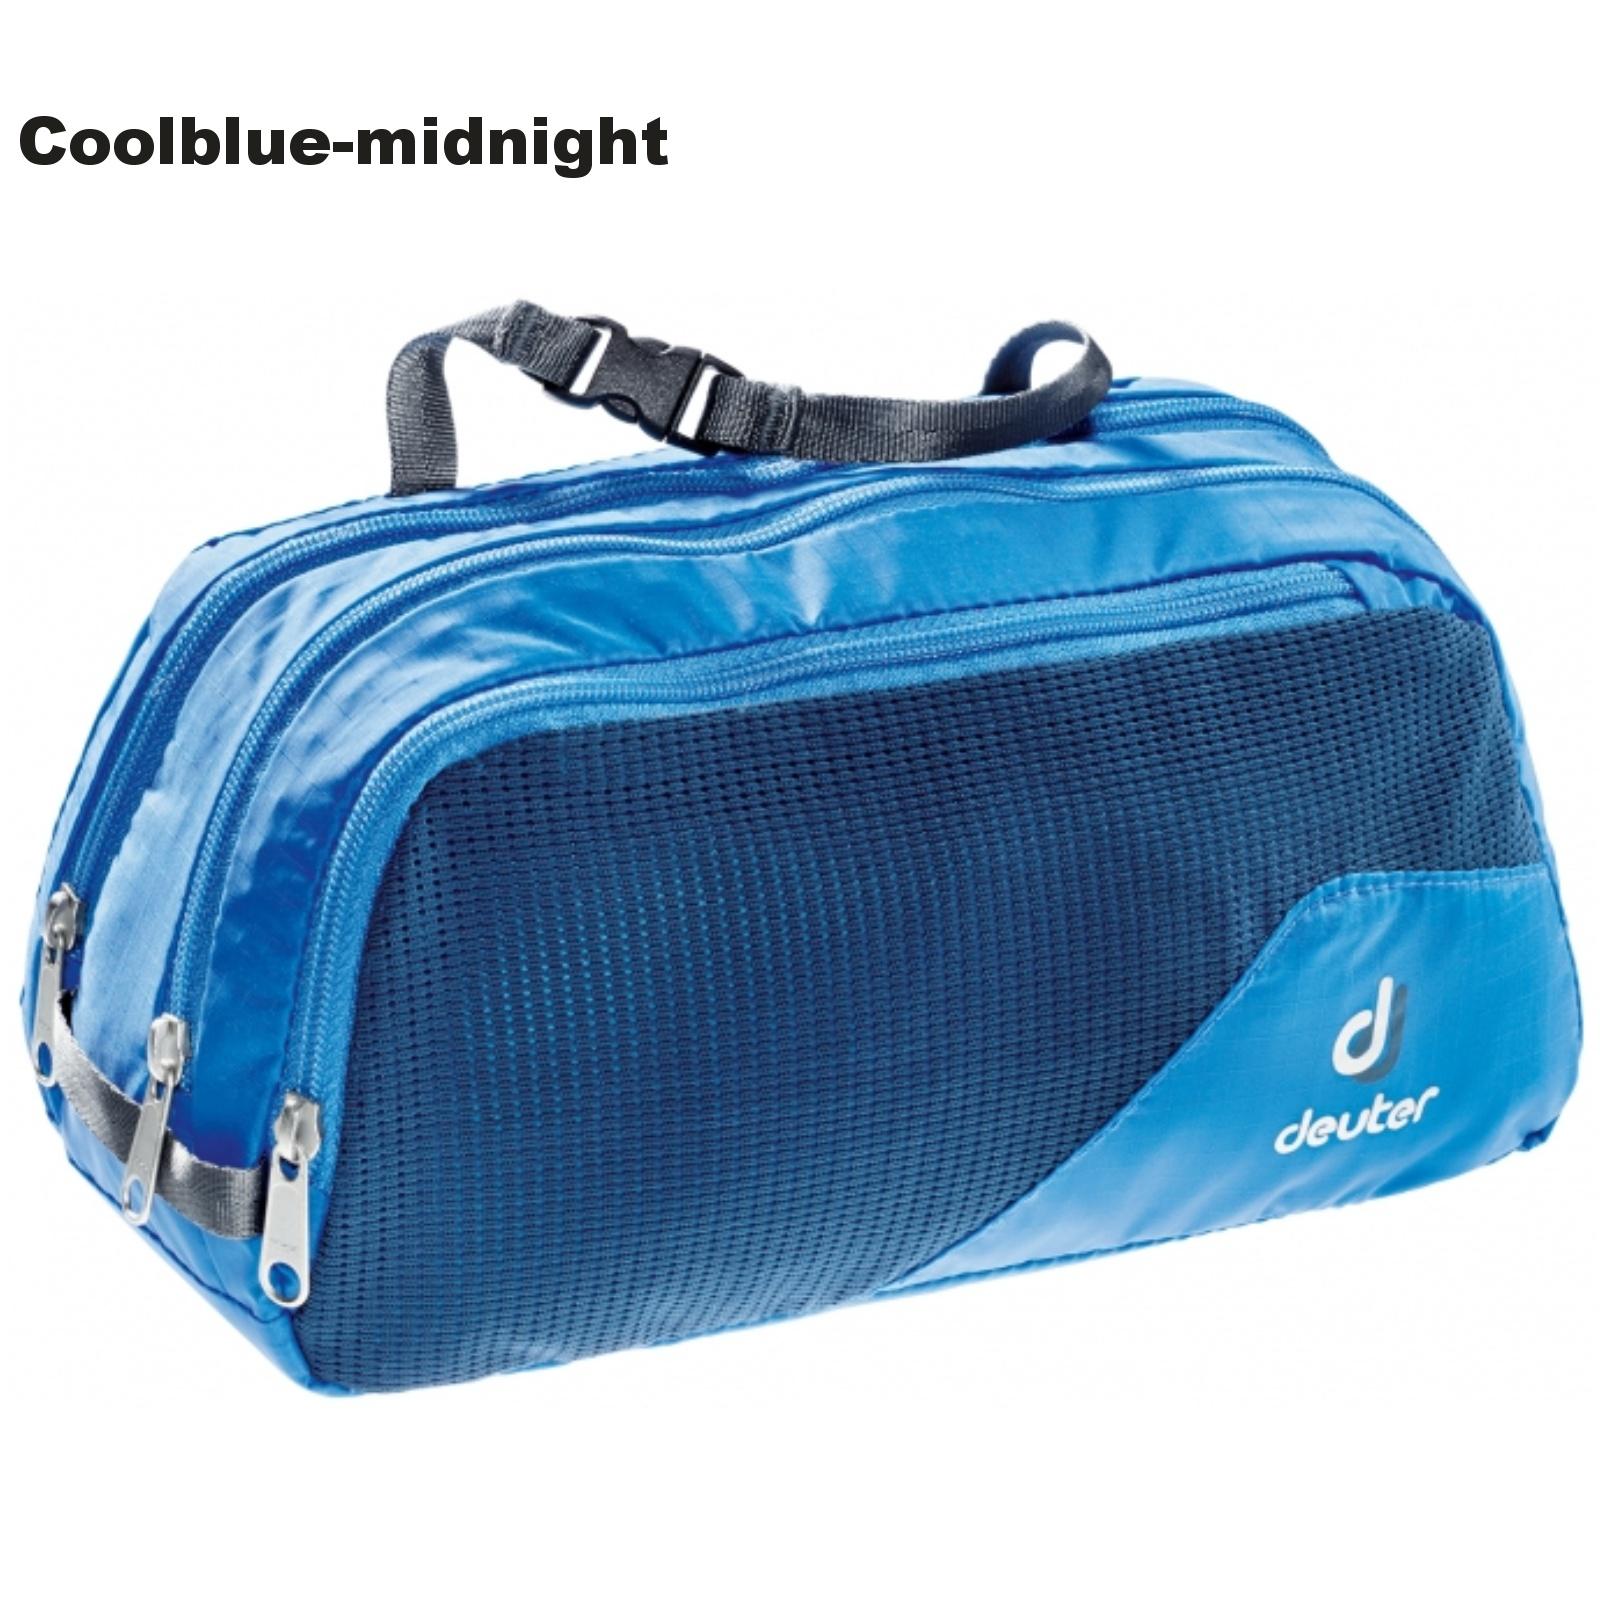 Toaletní taška DEUTER Wash Bag Tour III - coolblue-midnight